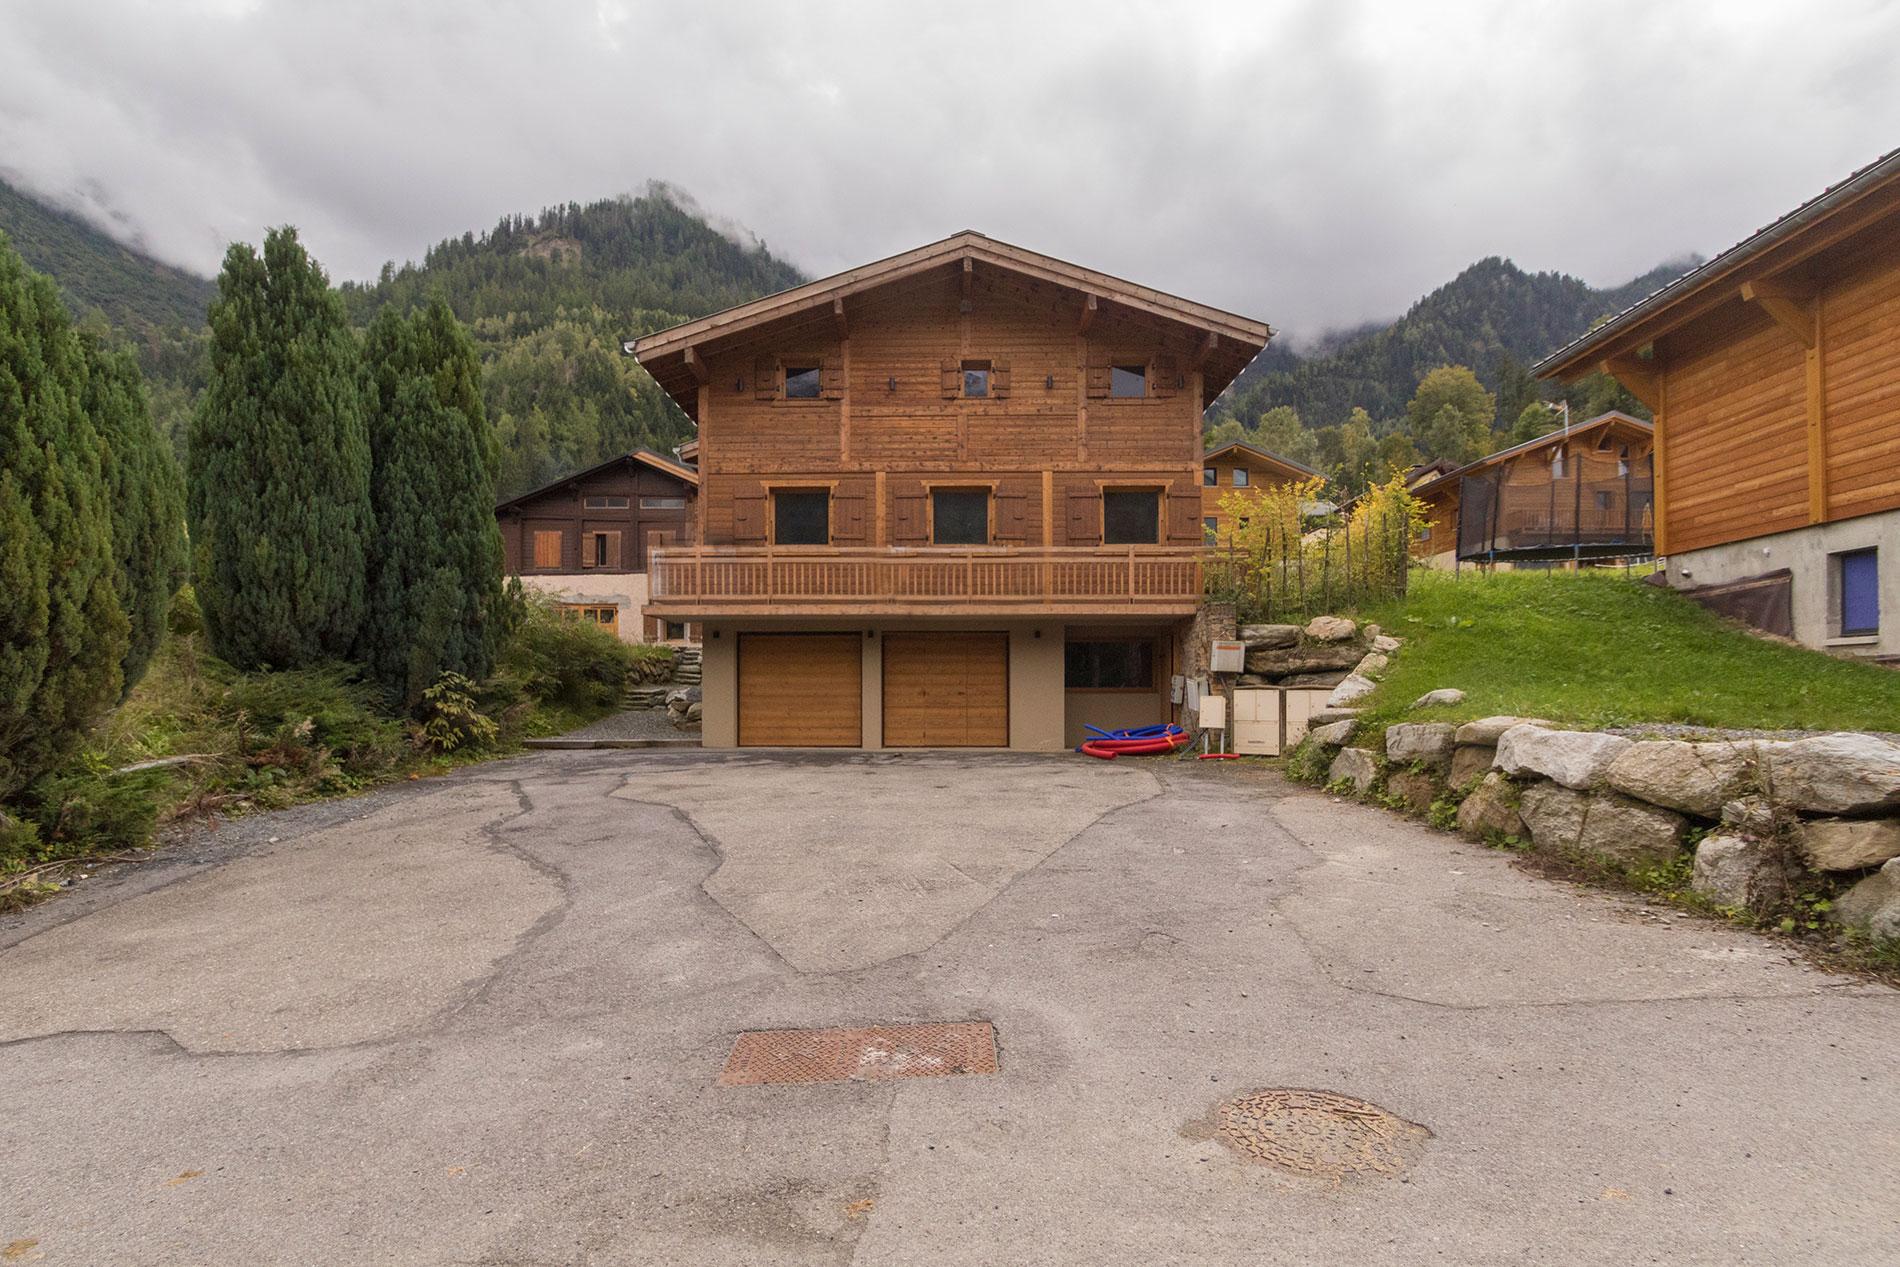 Chalet a les houches chalets mont blanc for Progetta i piani domestici delle tradizioni